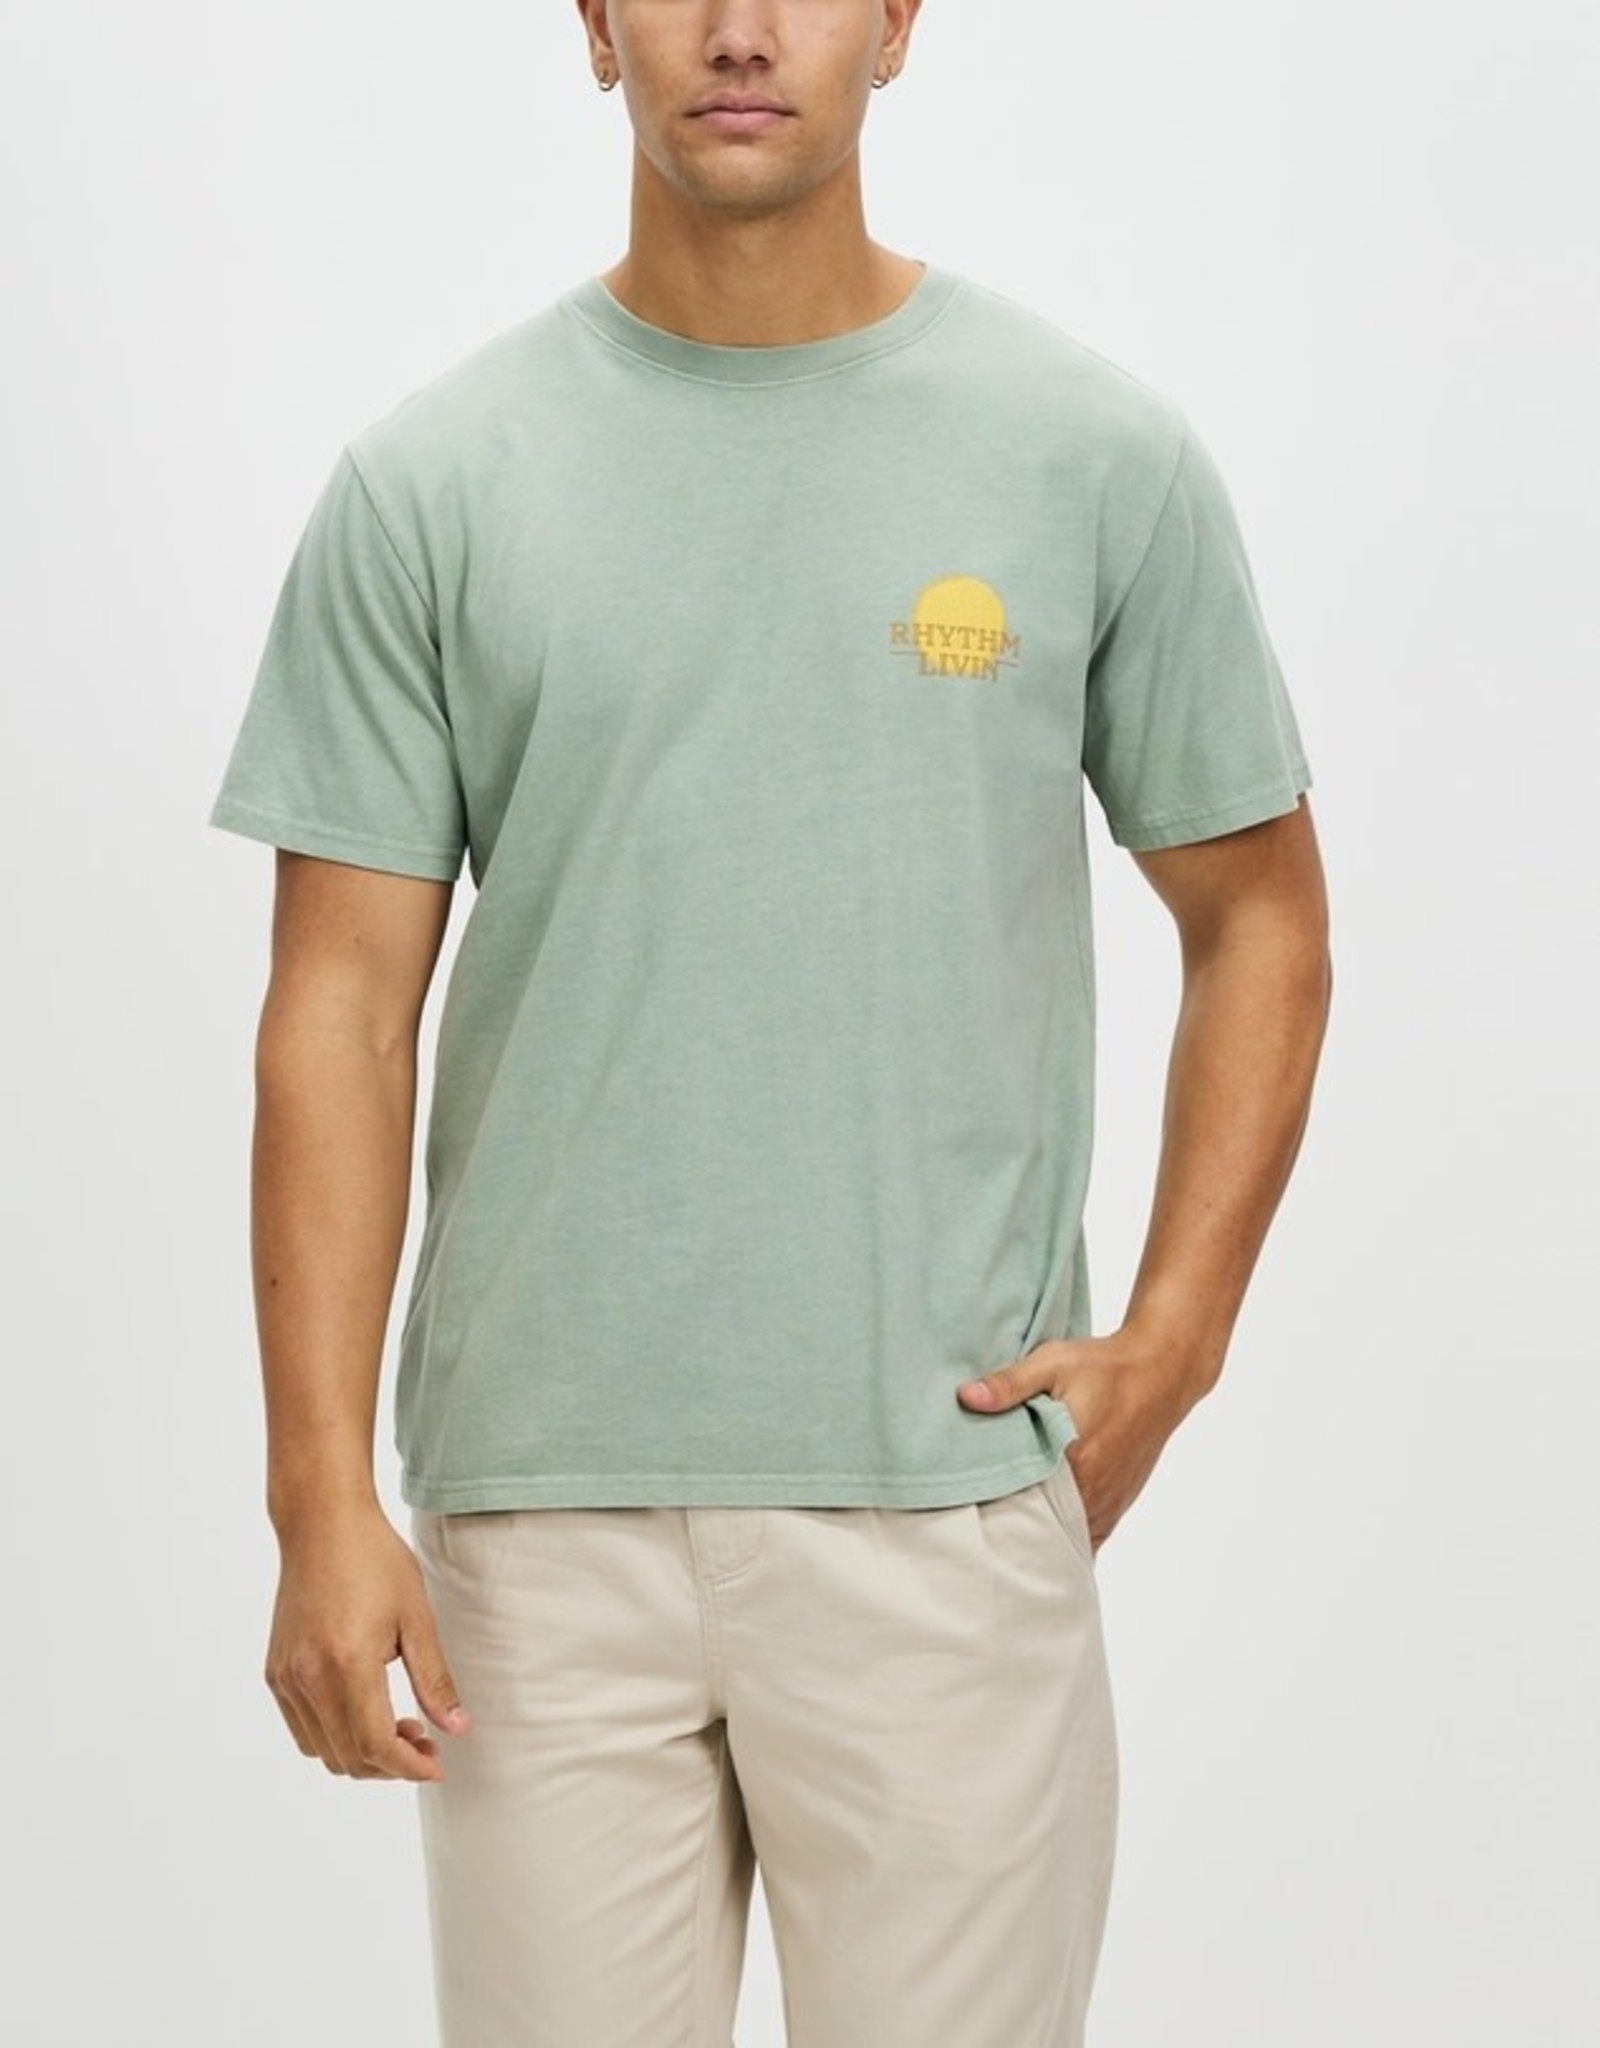 RHYTHM Tides SS Vintage TShirt